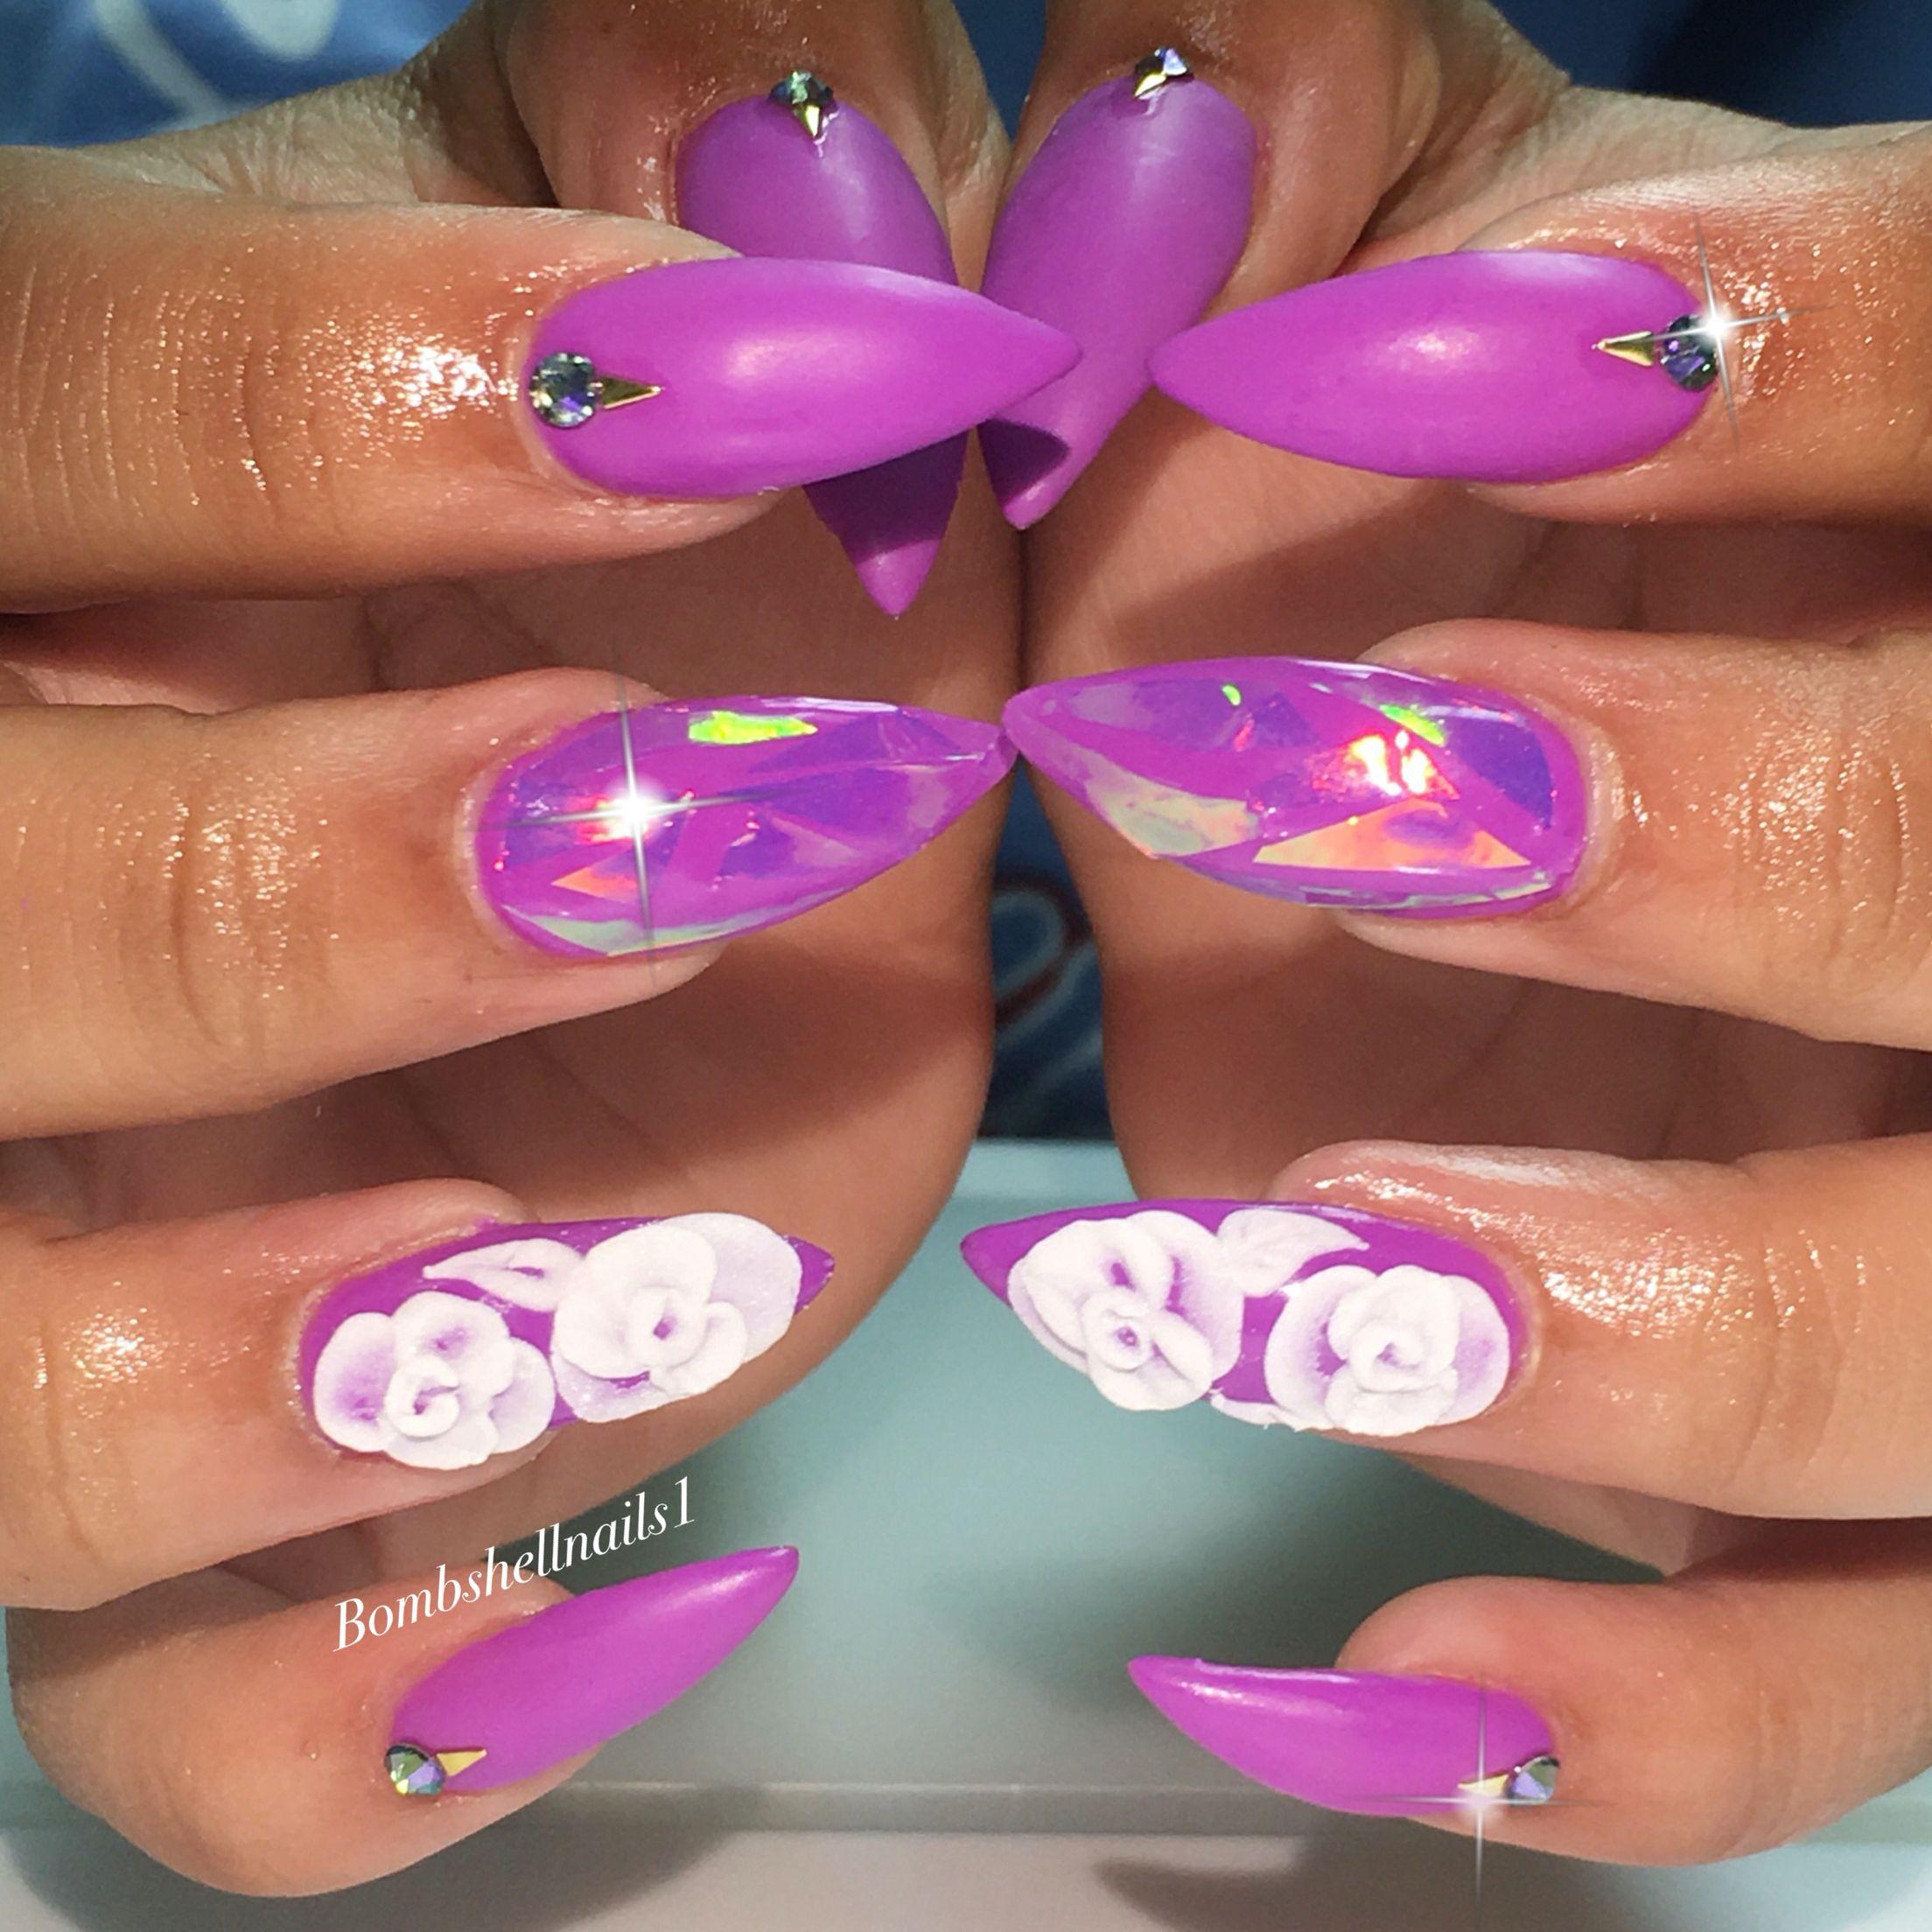 Stilettos, Kiara sky gel polish , 3D roses | Bombshell nails ...